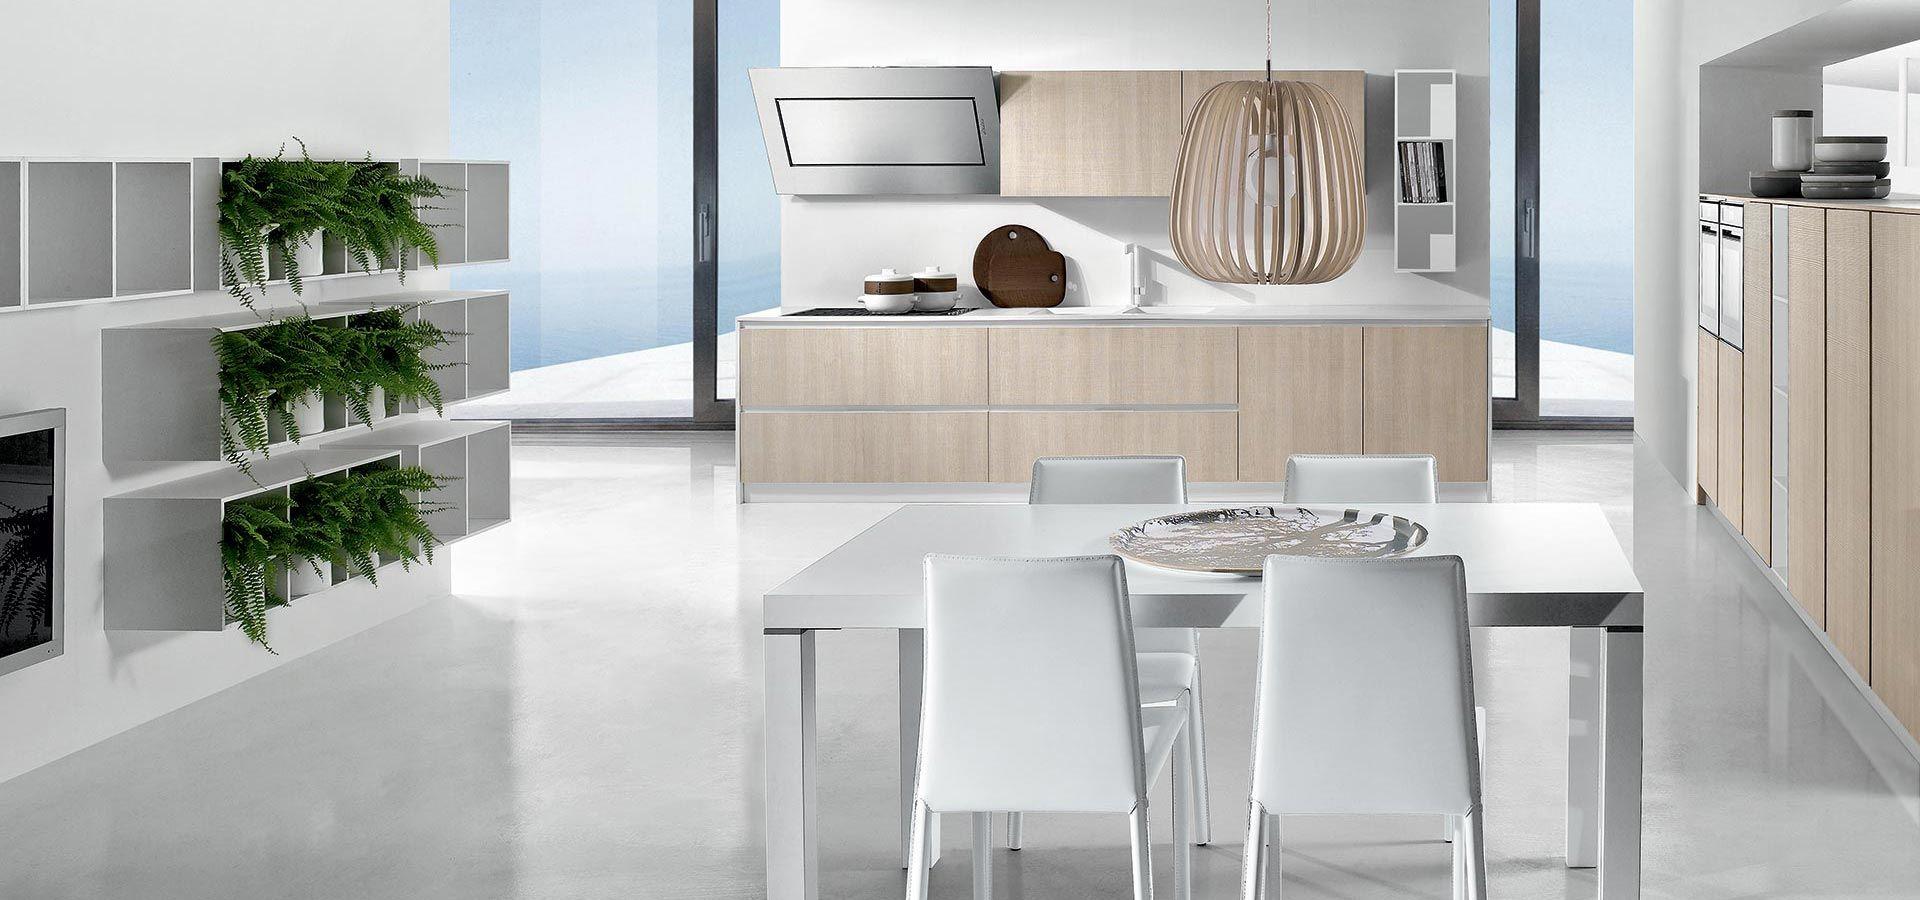 Cucina Moderna - Round Finitura tranchès rovere sabbia | Piano in ...